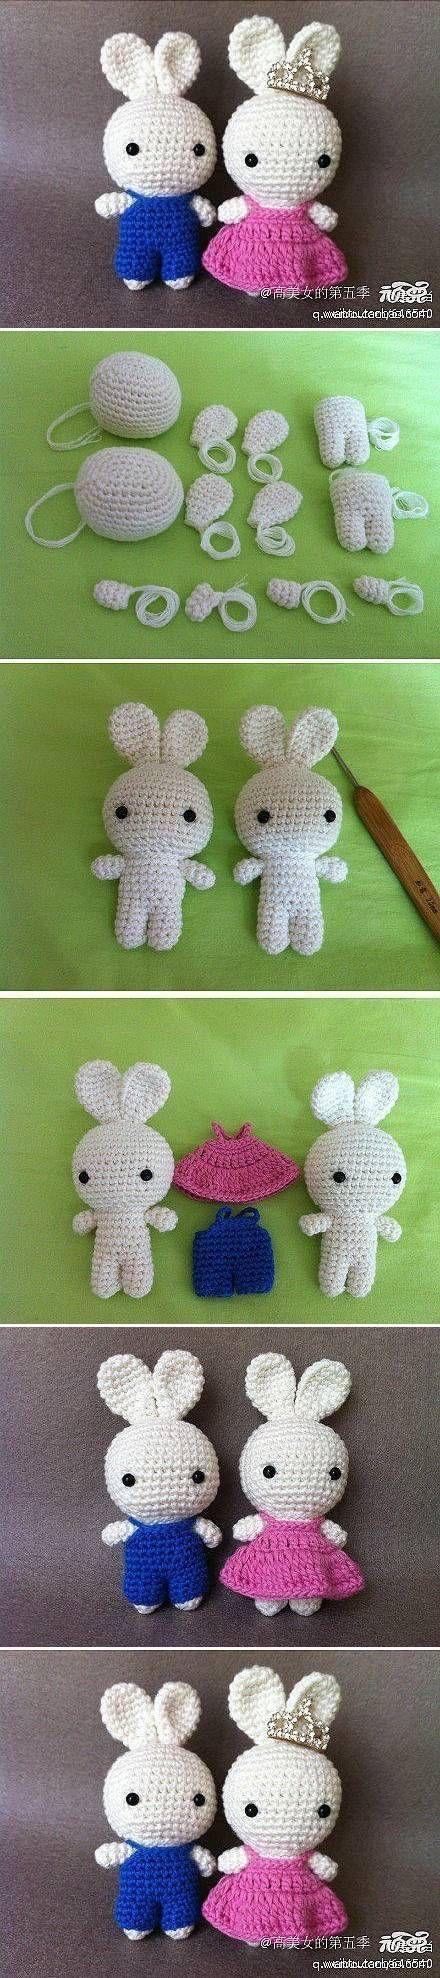 DIY Cute Crochet Bunny Couple DIY Projects | UsefulDIY.com